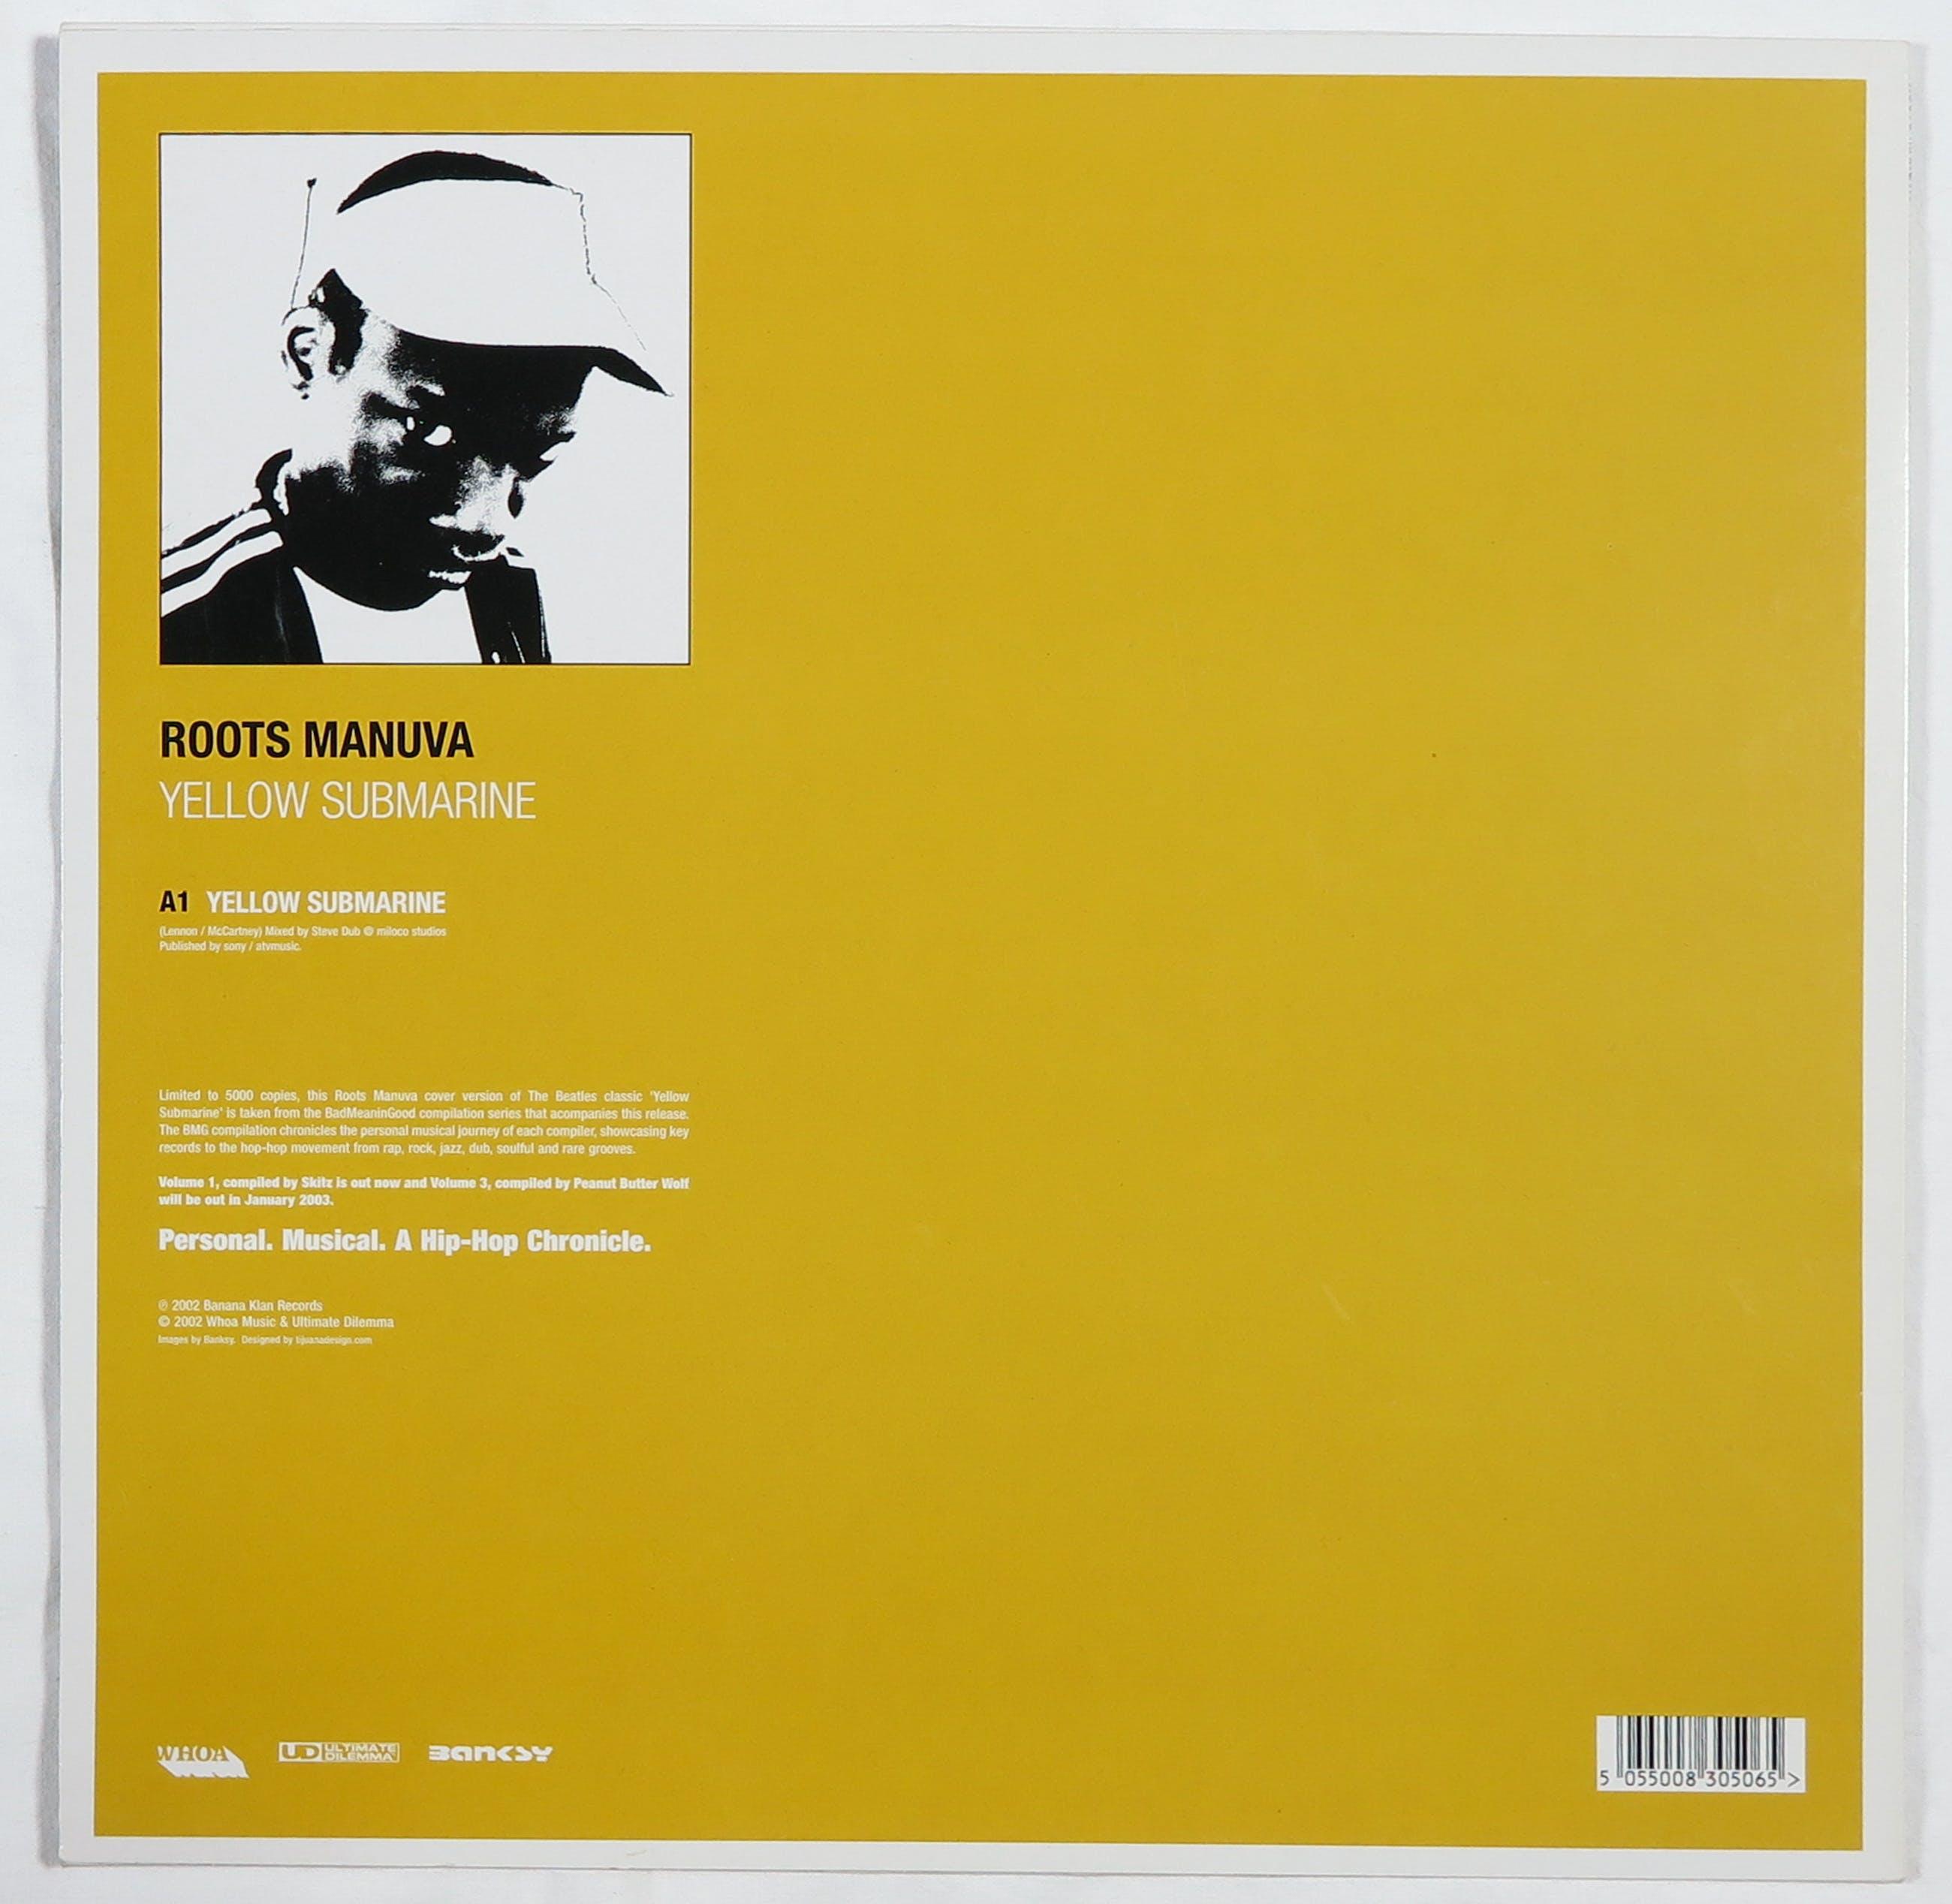 Banksy - LP-hoes, Roots Manuva: Yellow Submarine (van Badmeaningood vol. 2) kopen? Bied vanaf 1!